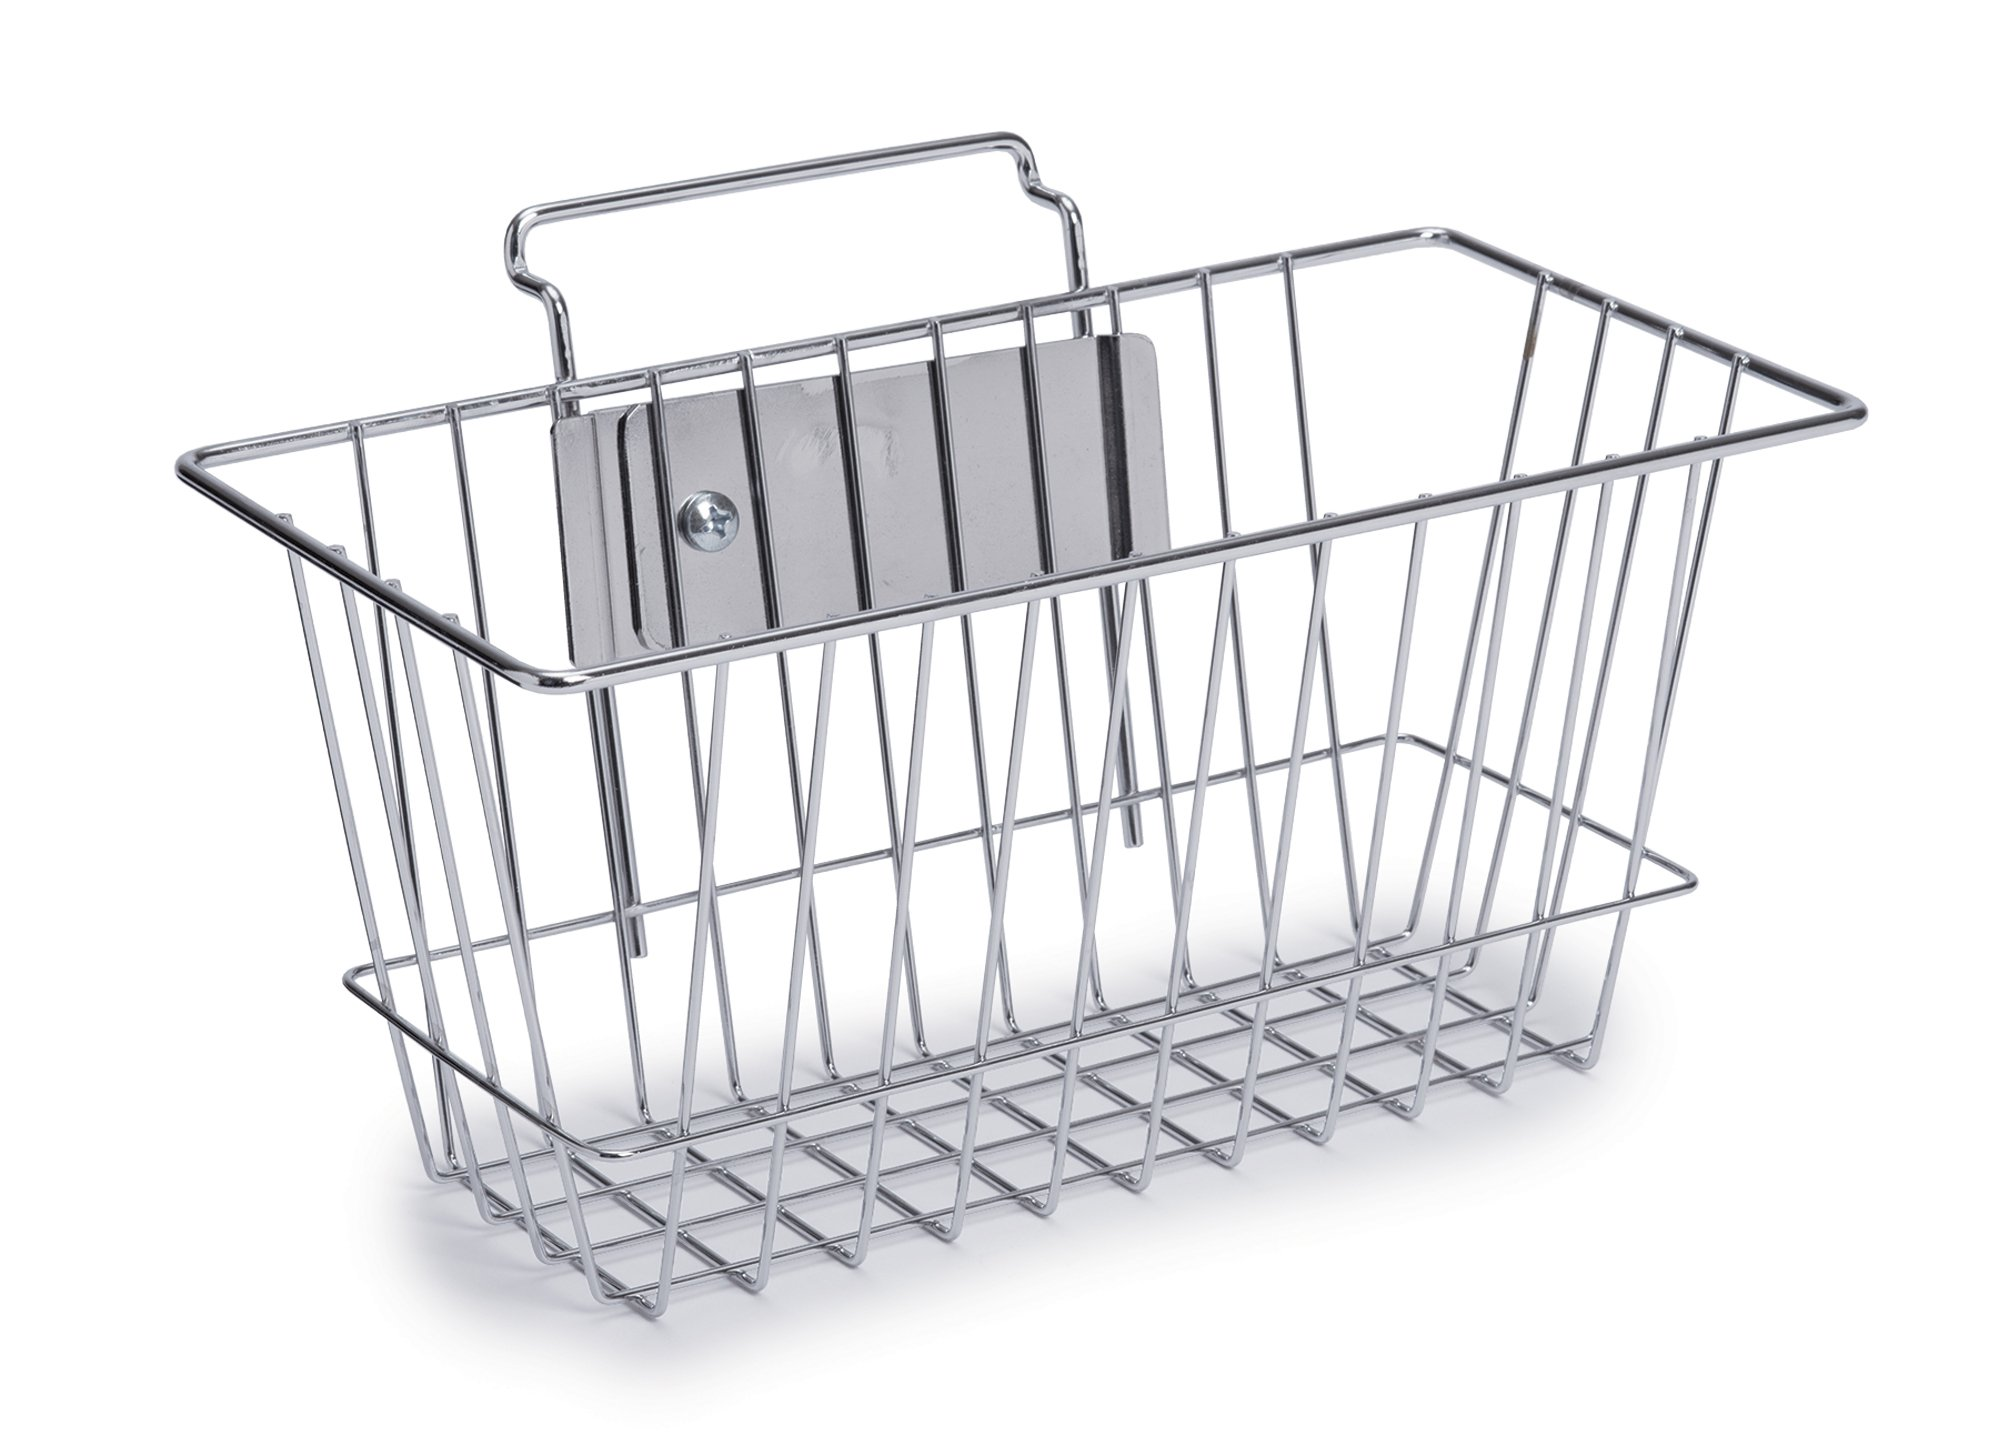 Universal IV Pole Accessories - Wire Basket